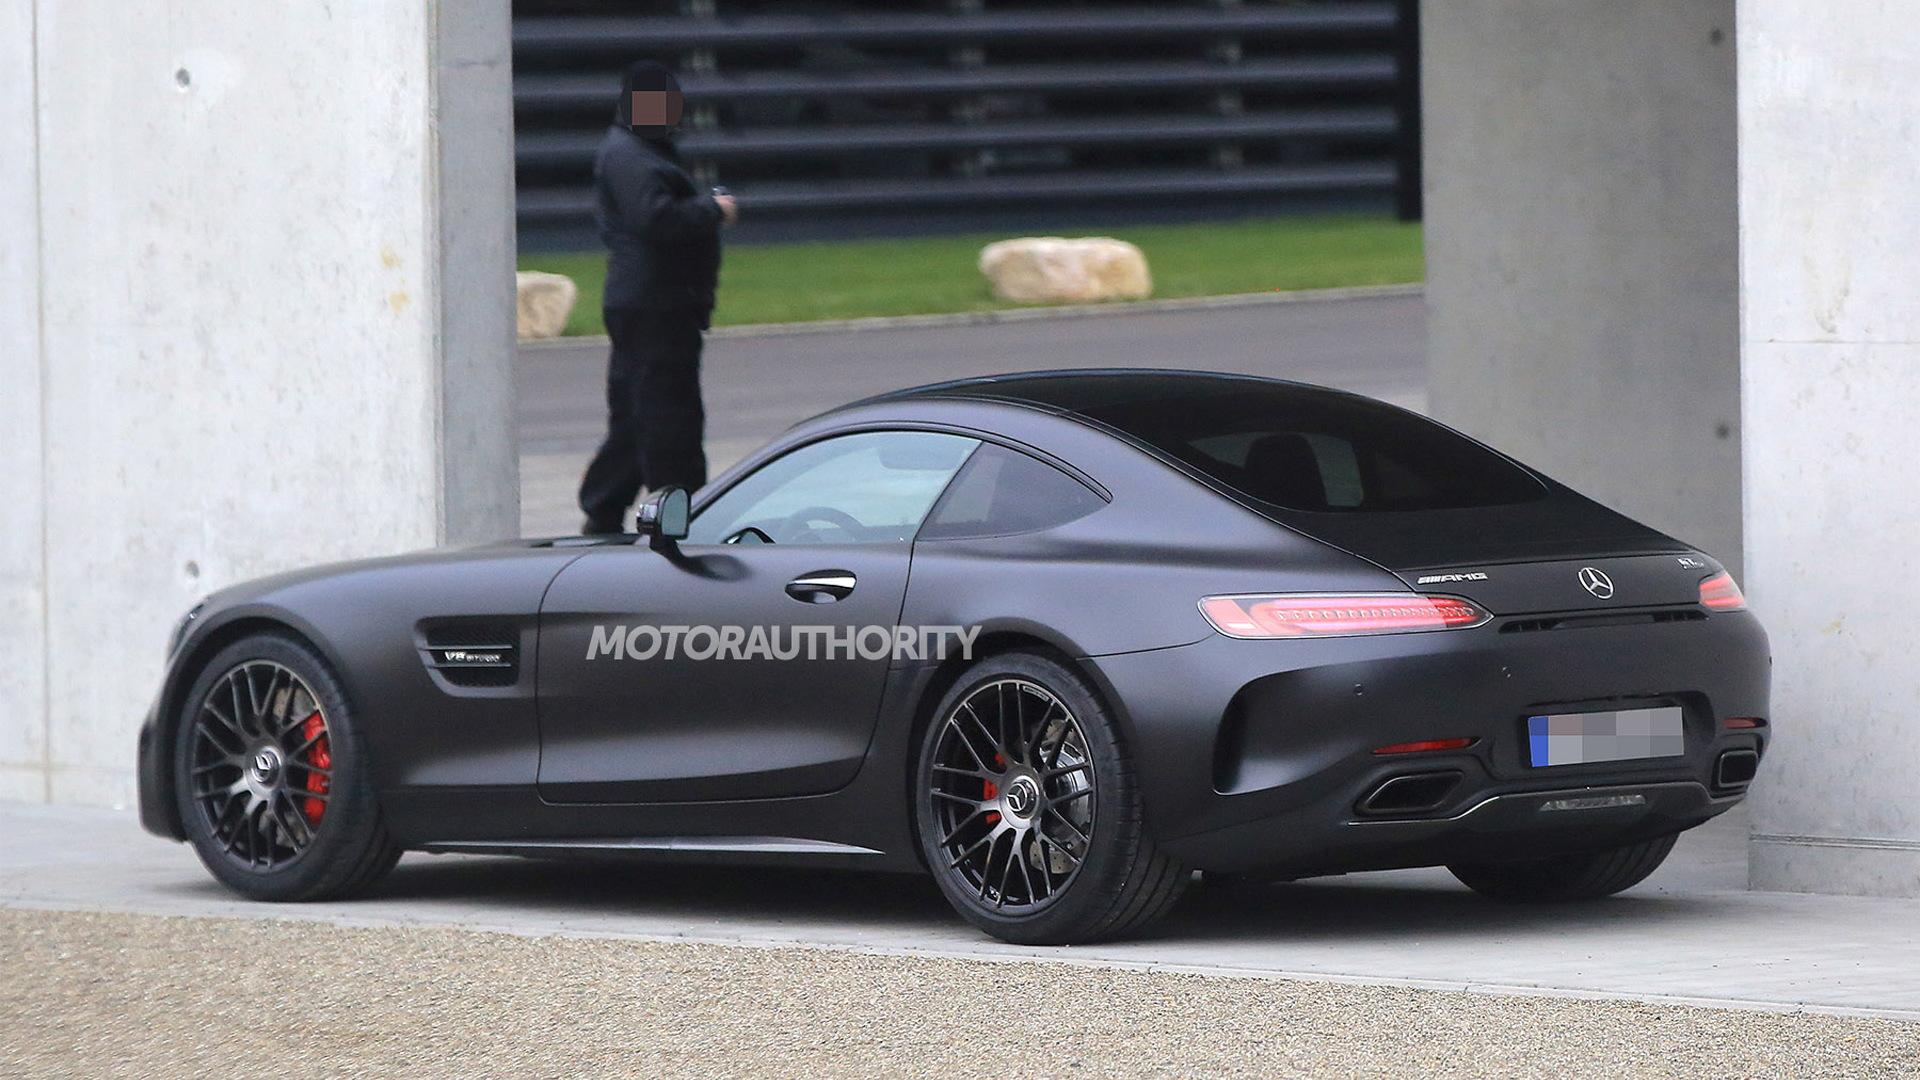 2018 Mercedes-AMG GT C spy shots - Image via S. Baldauf/SB-Medien